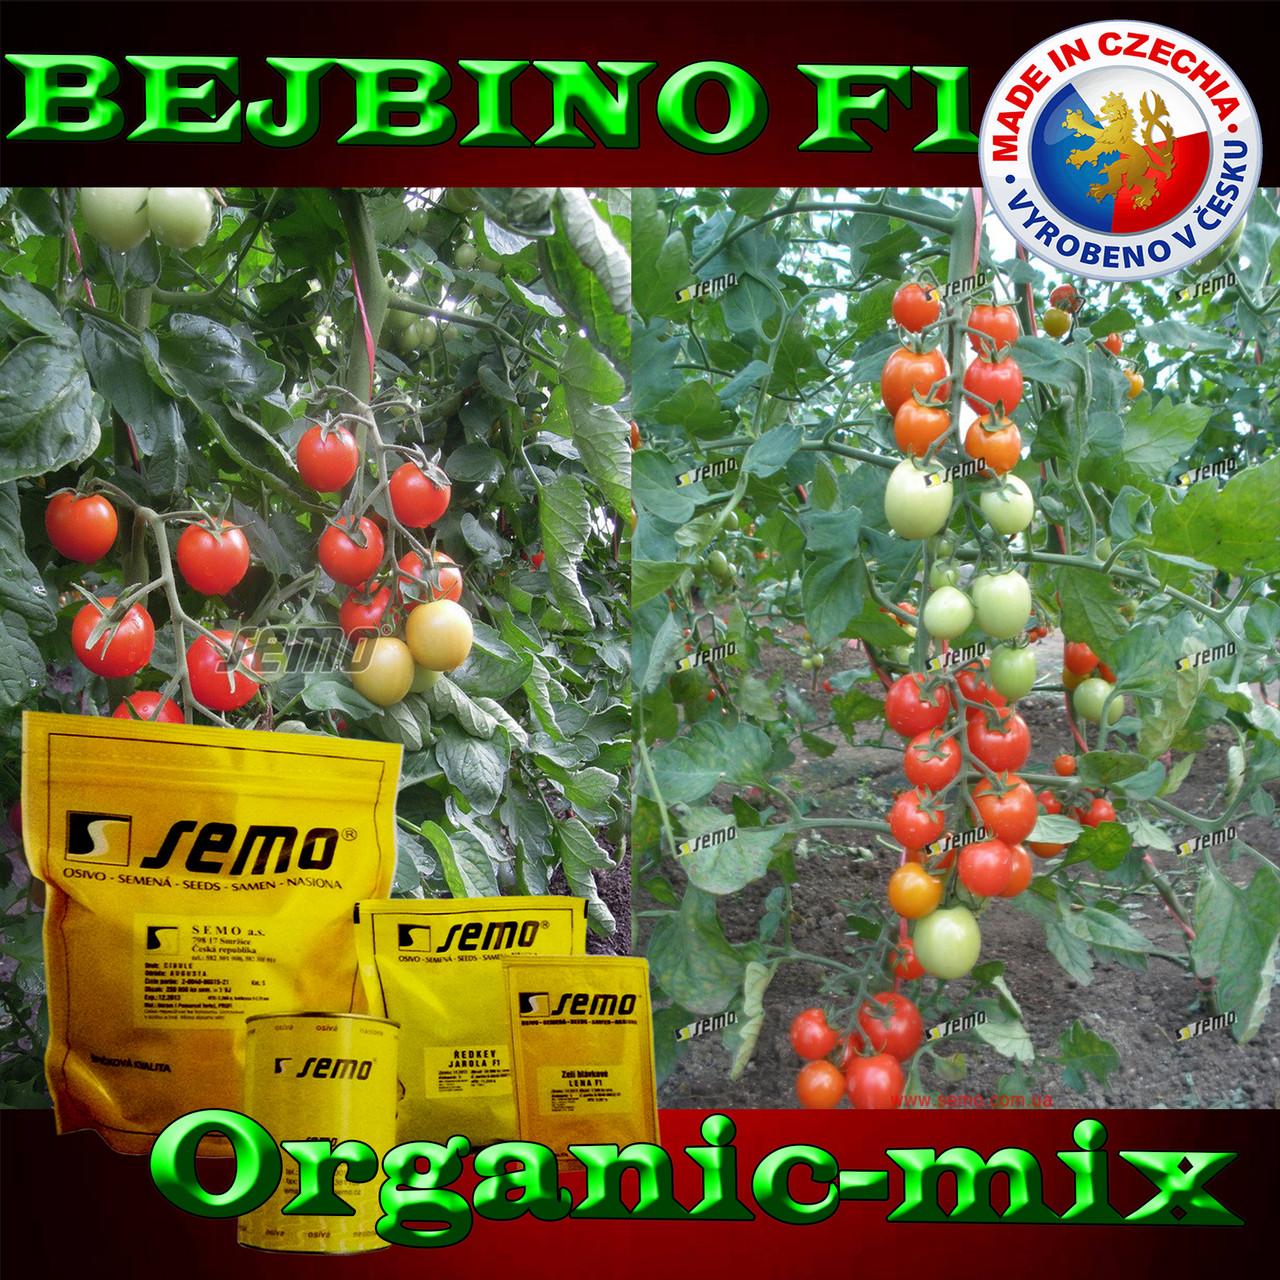 Семена, томат индетерминантный Бейбино F1 (коктейльный тип), ТМ Semo, 1000 семян